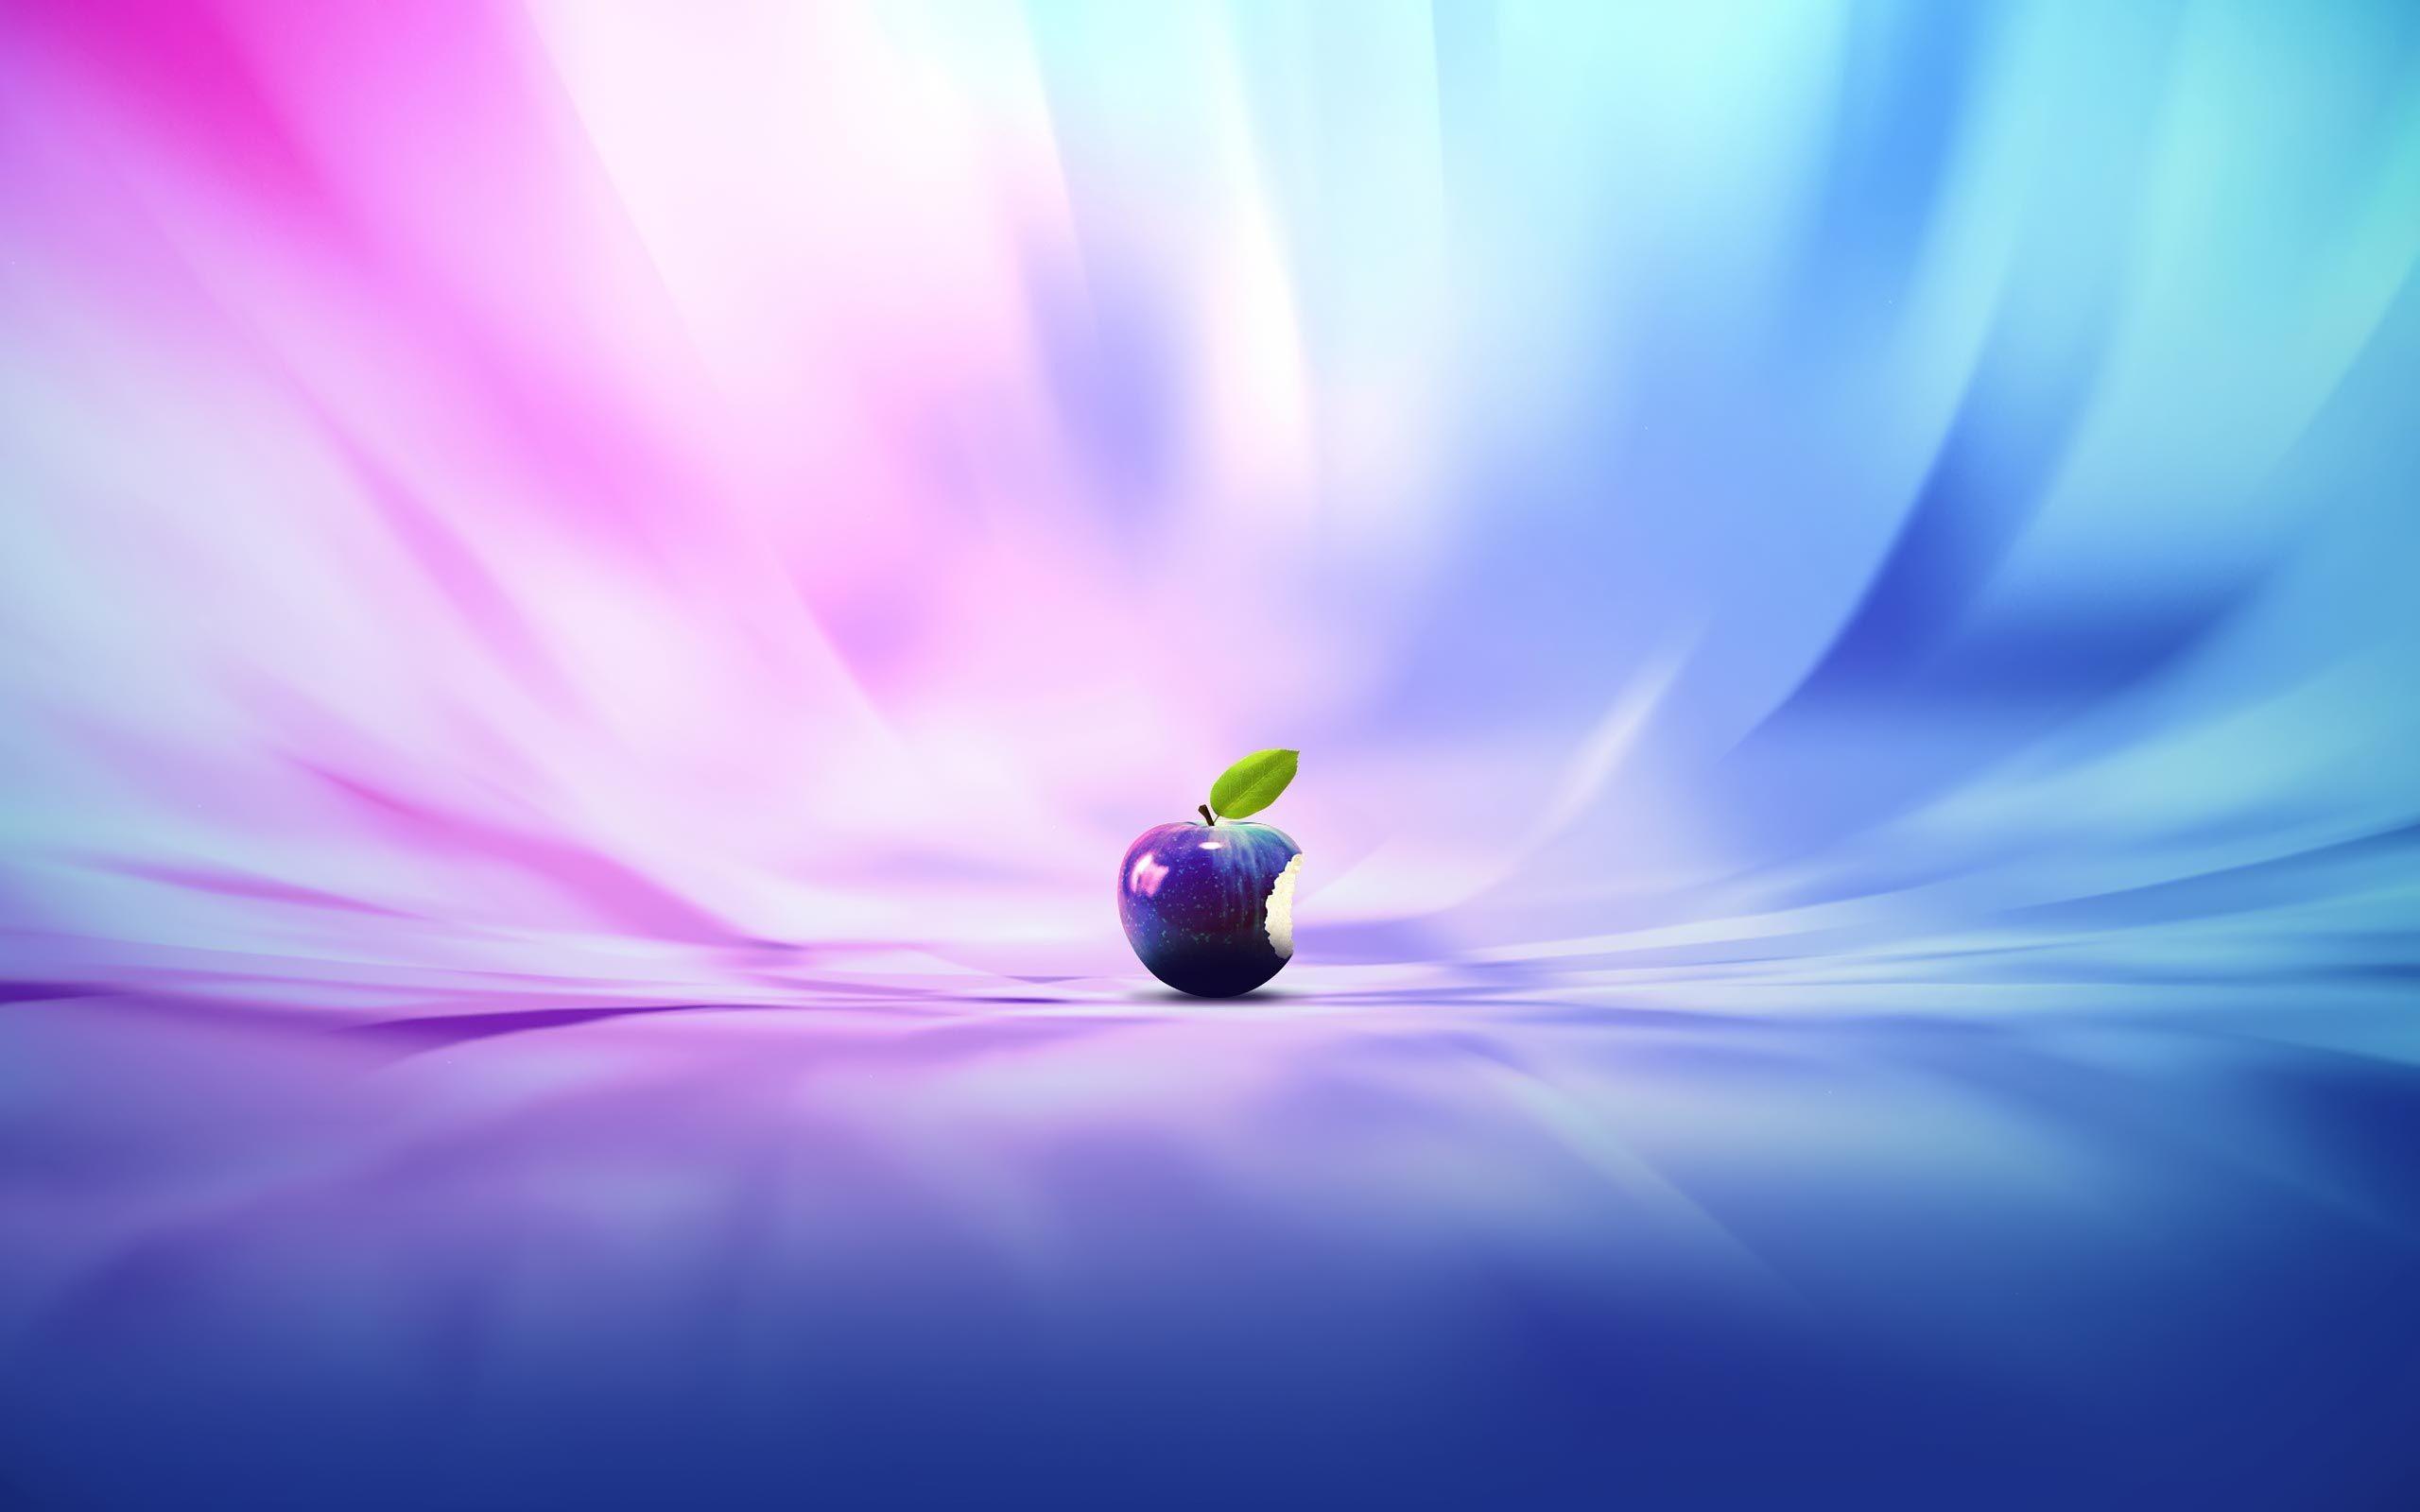 Macbook Pro Desktop Wallpaper - Apple Wallpaper Hd , HD Wallpaper & Backgrounds